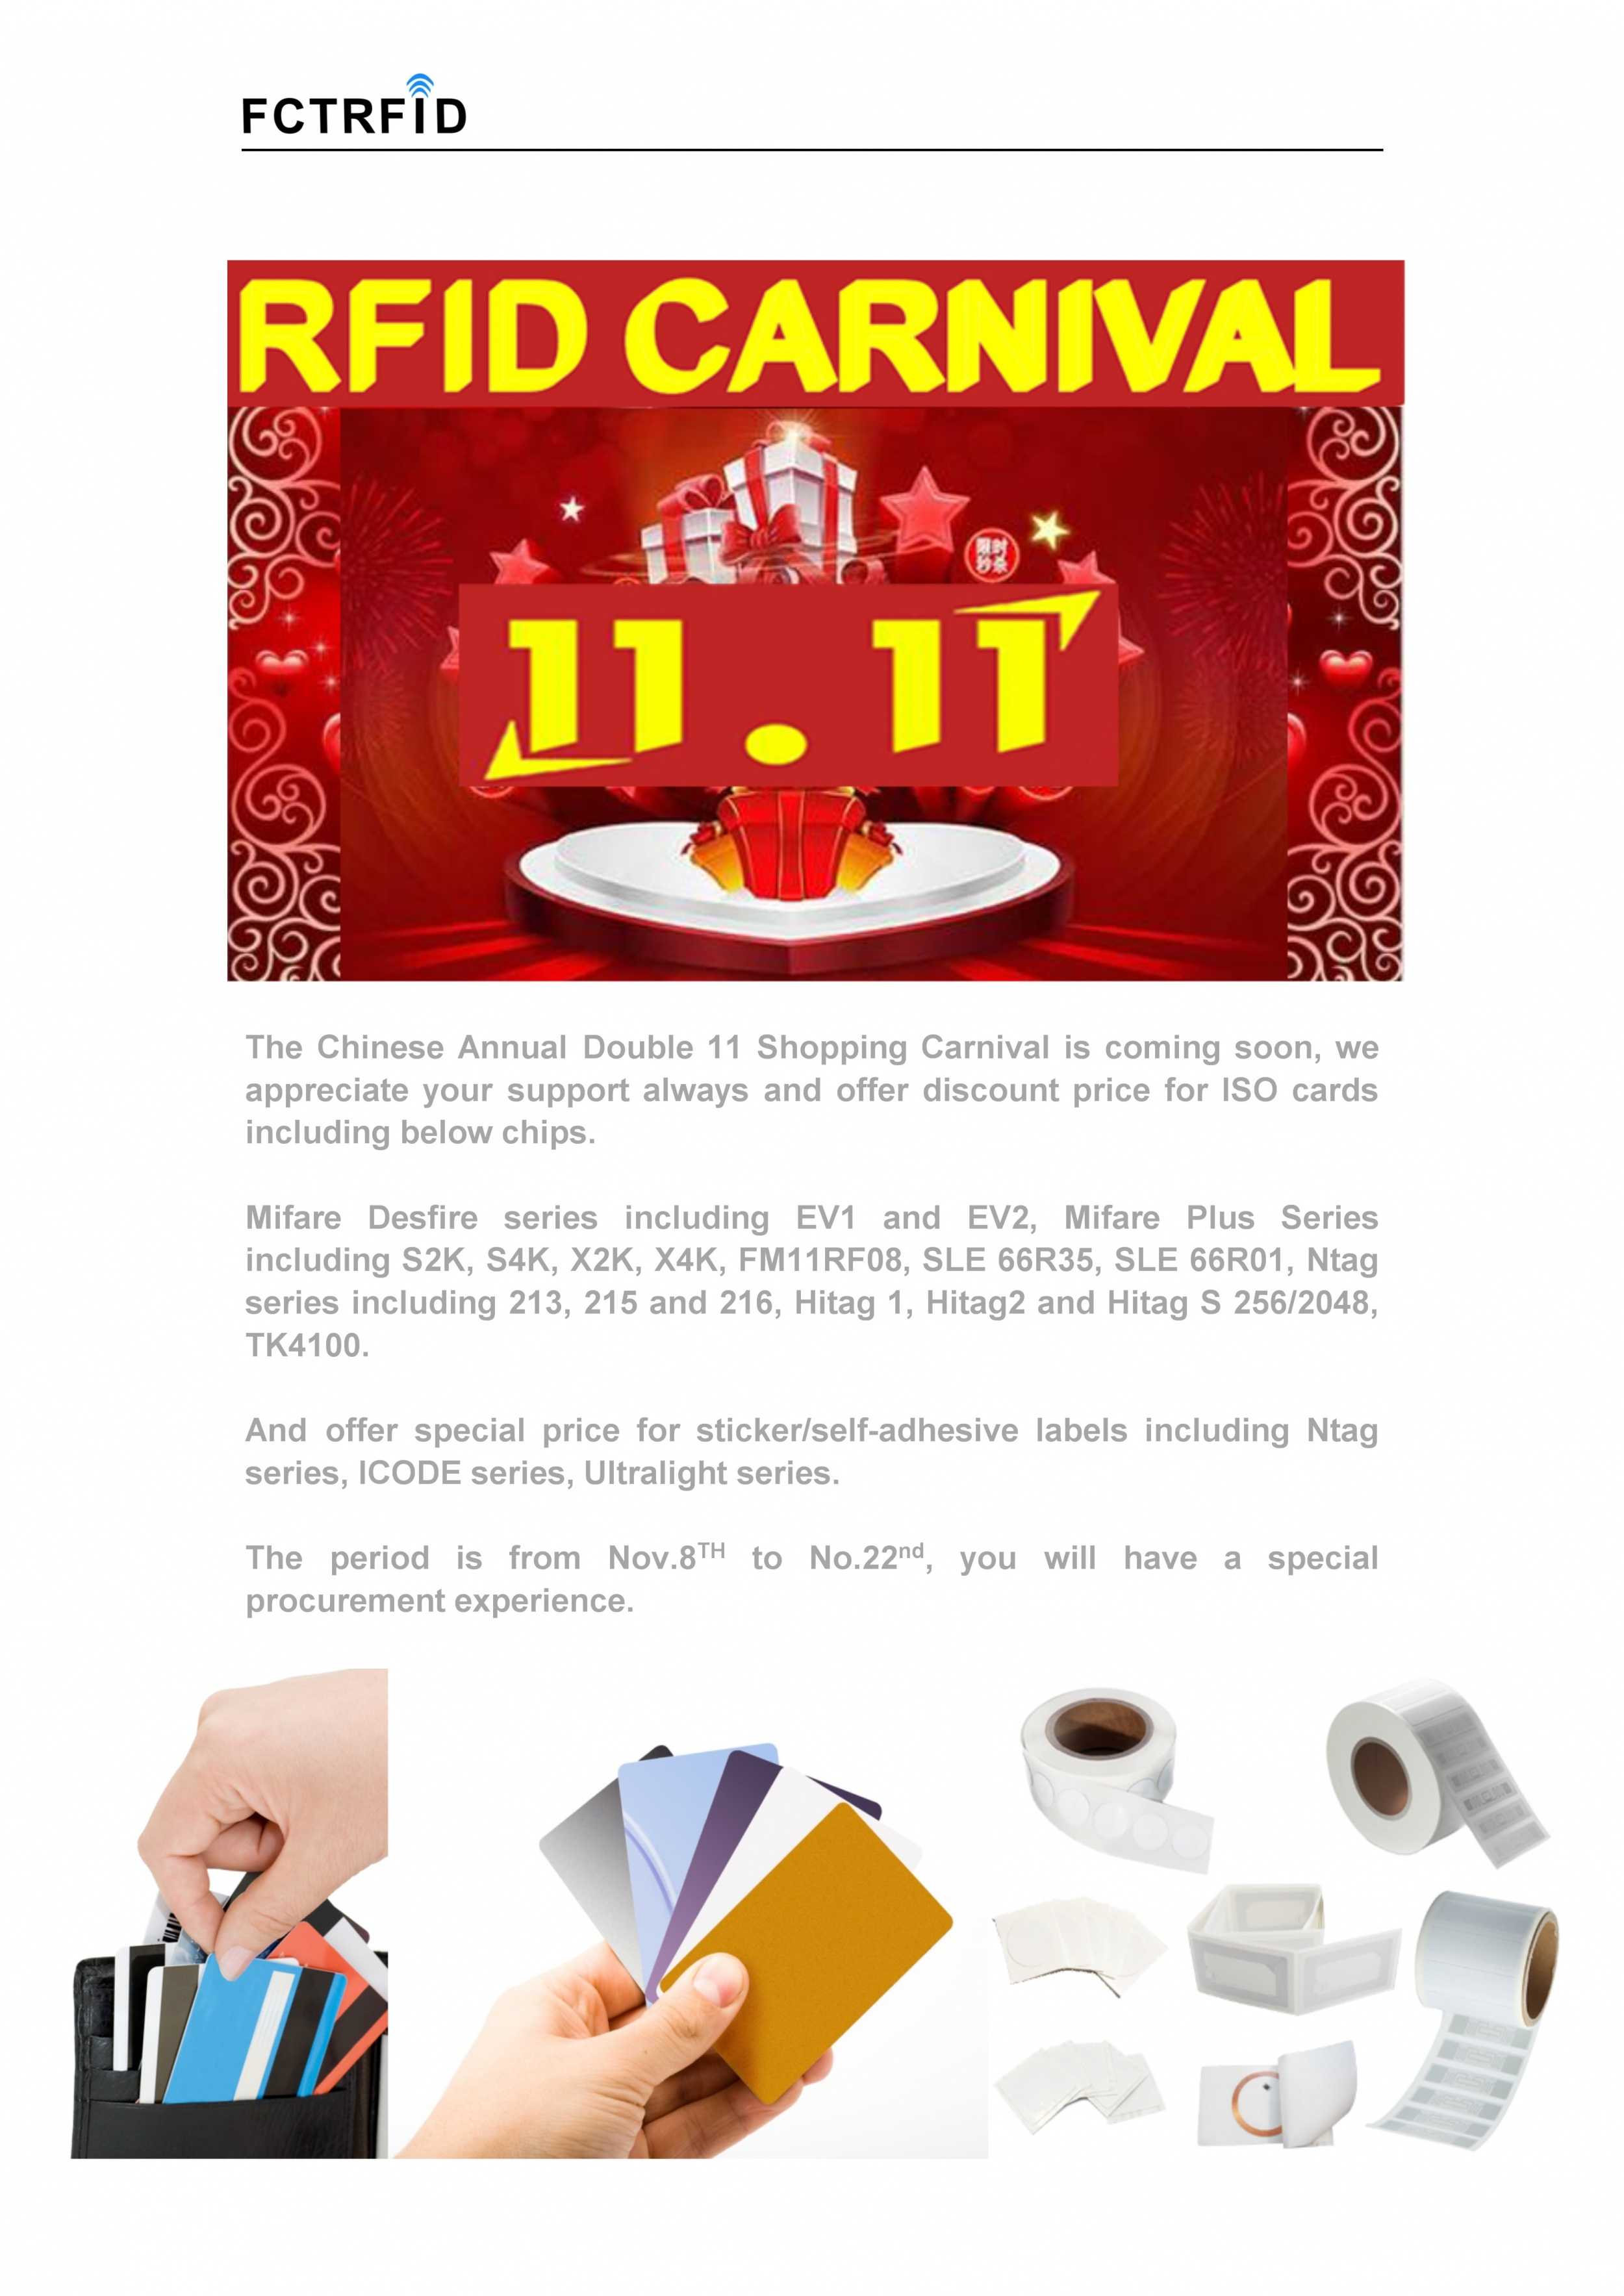 RFID CARNIVAL 11.11